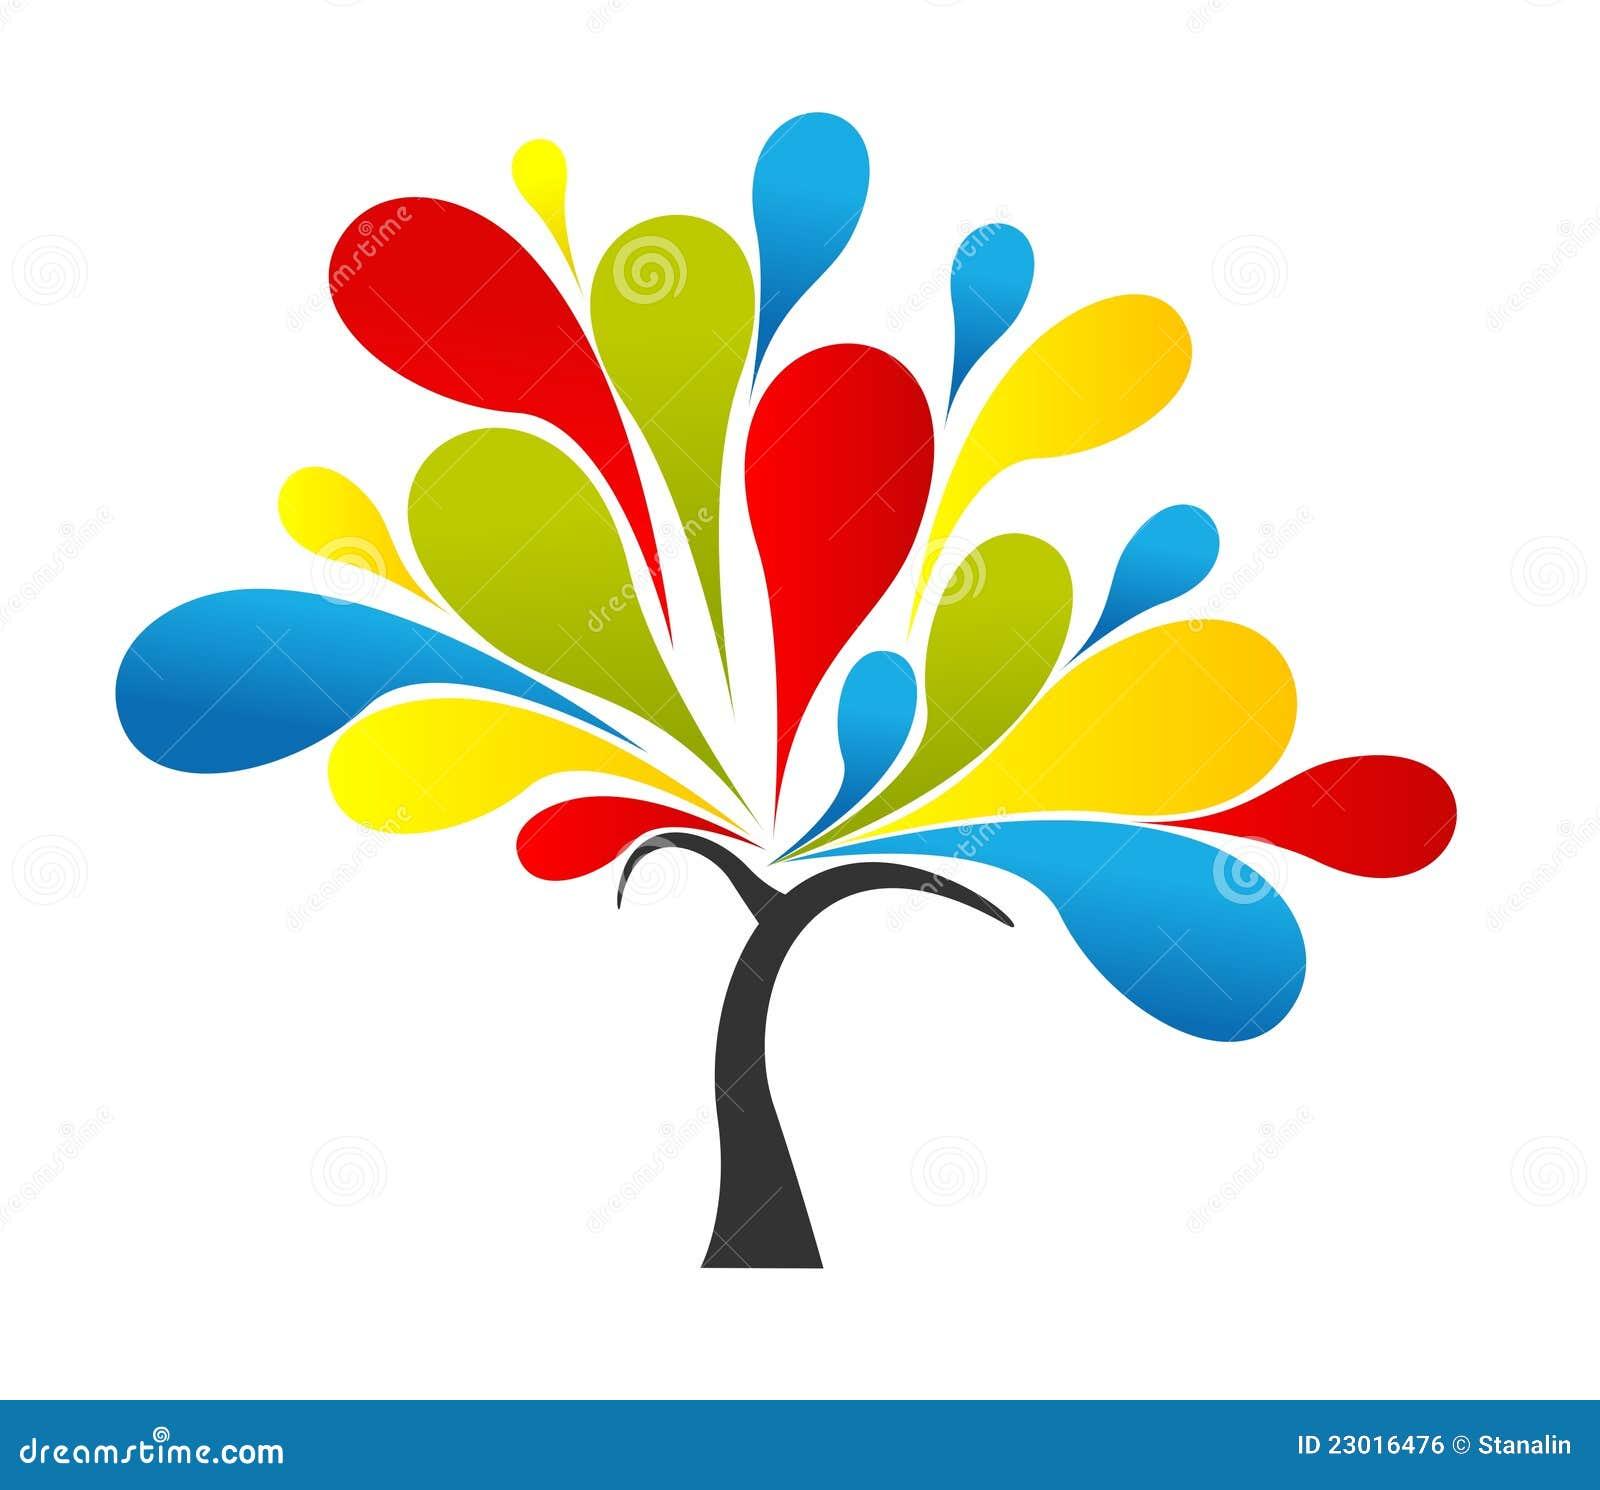 Tree Logo Vector Royalty Free Stock Image - Image: 23016476